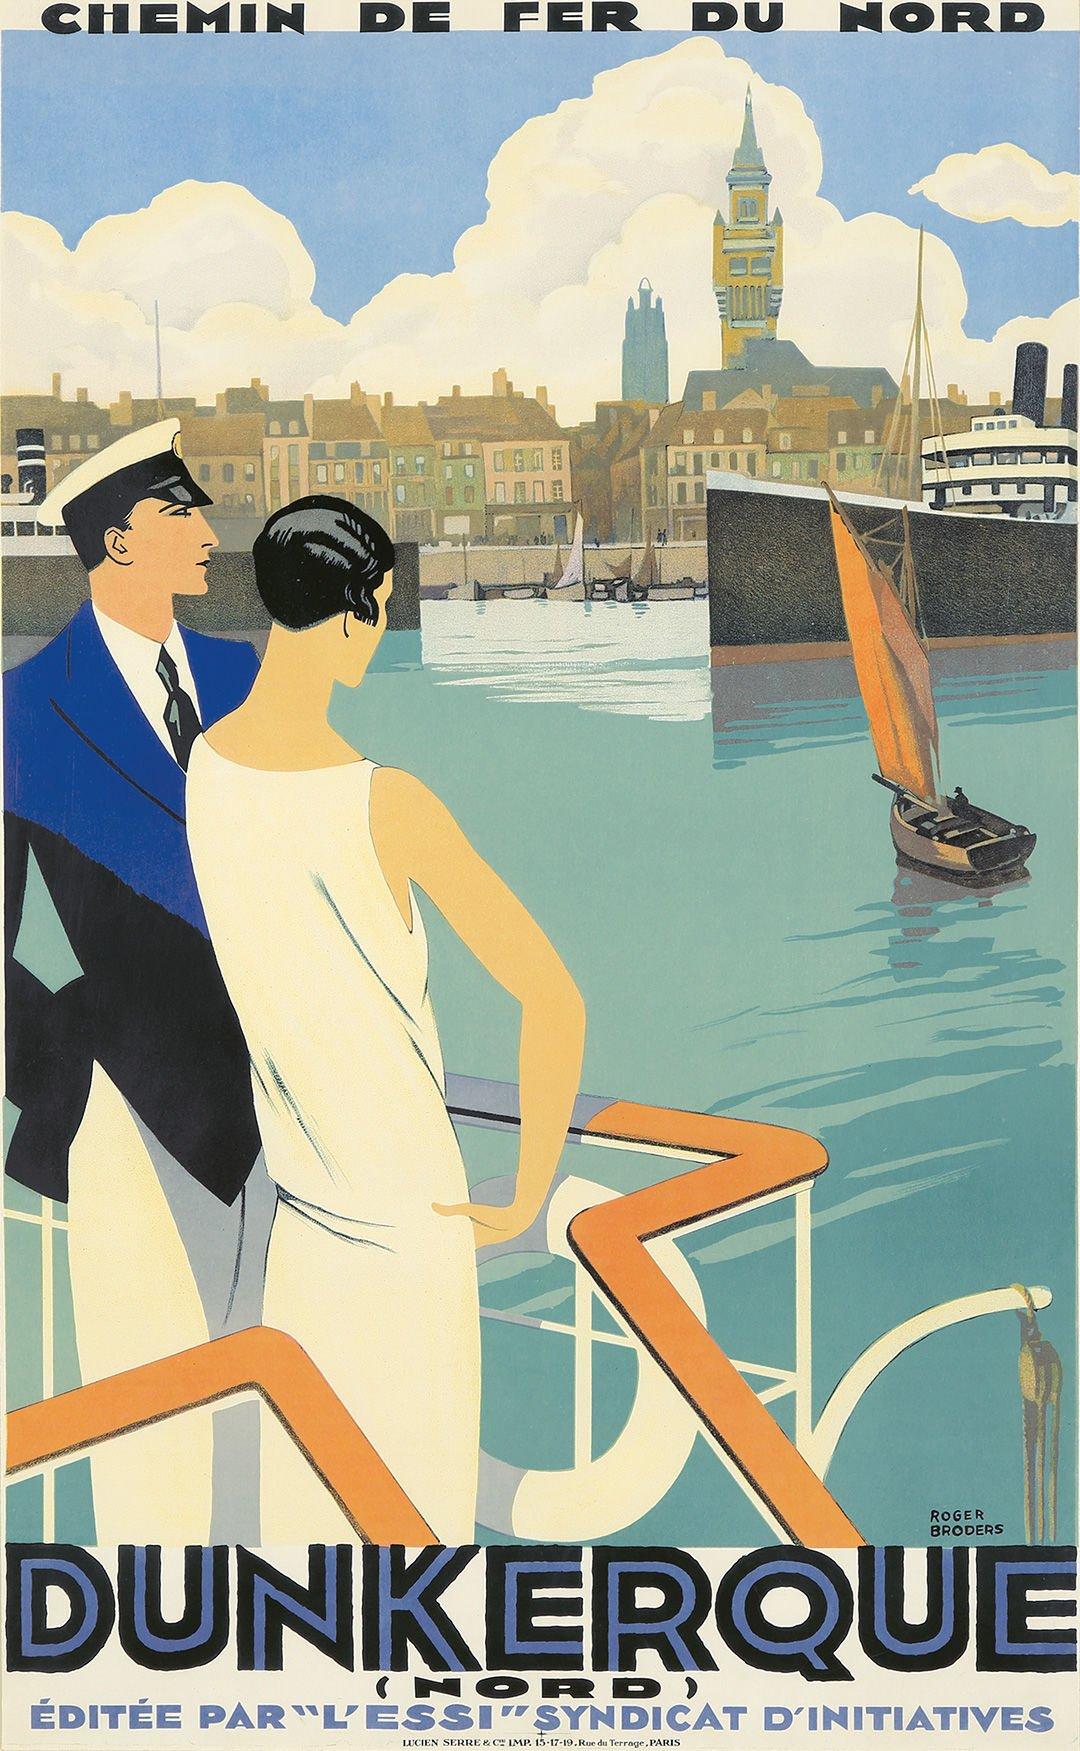 Roger Broders, Dunkerque. 1929.